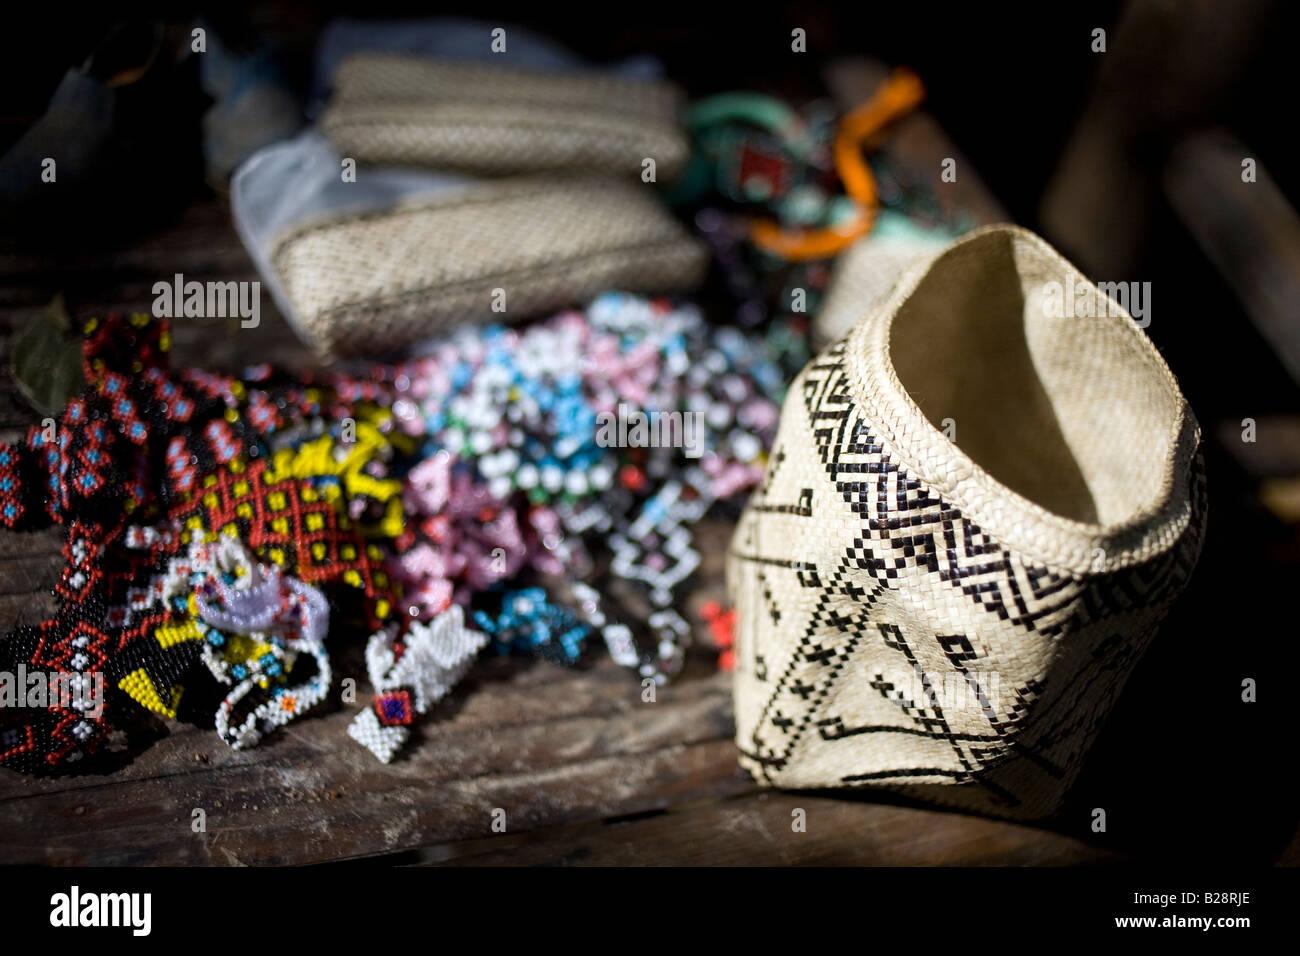 Mangyan crafts created in the Panaytayan community near Mansalay, Oriental Mindoro, Philippines. - Stock Image